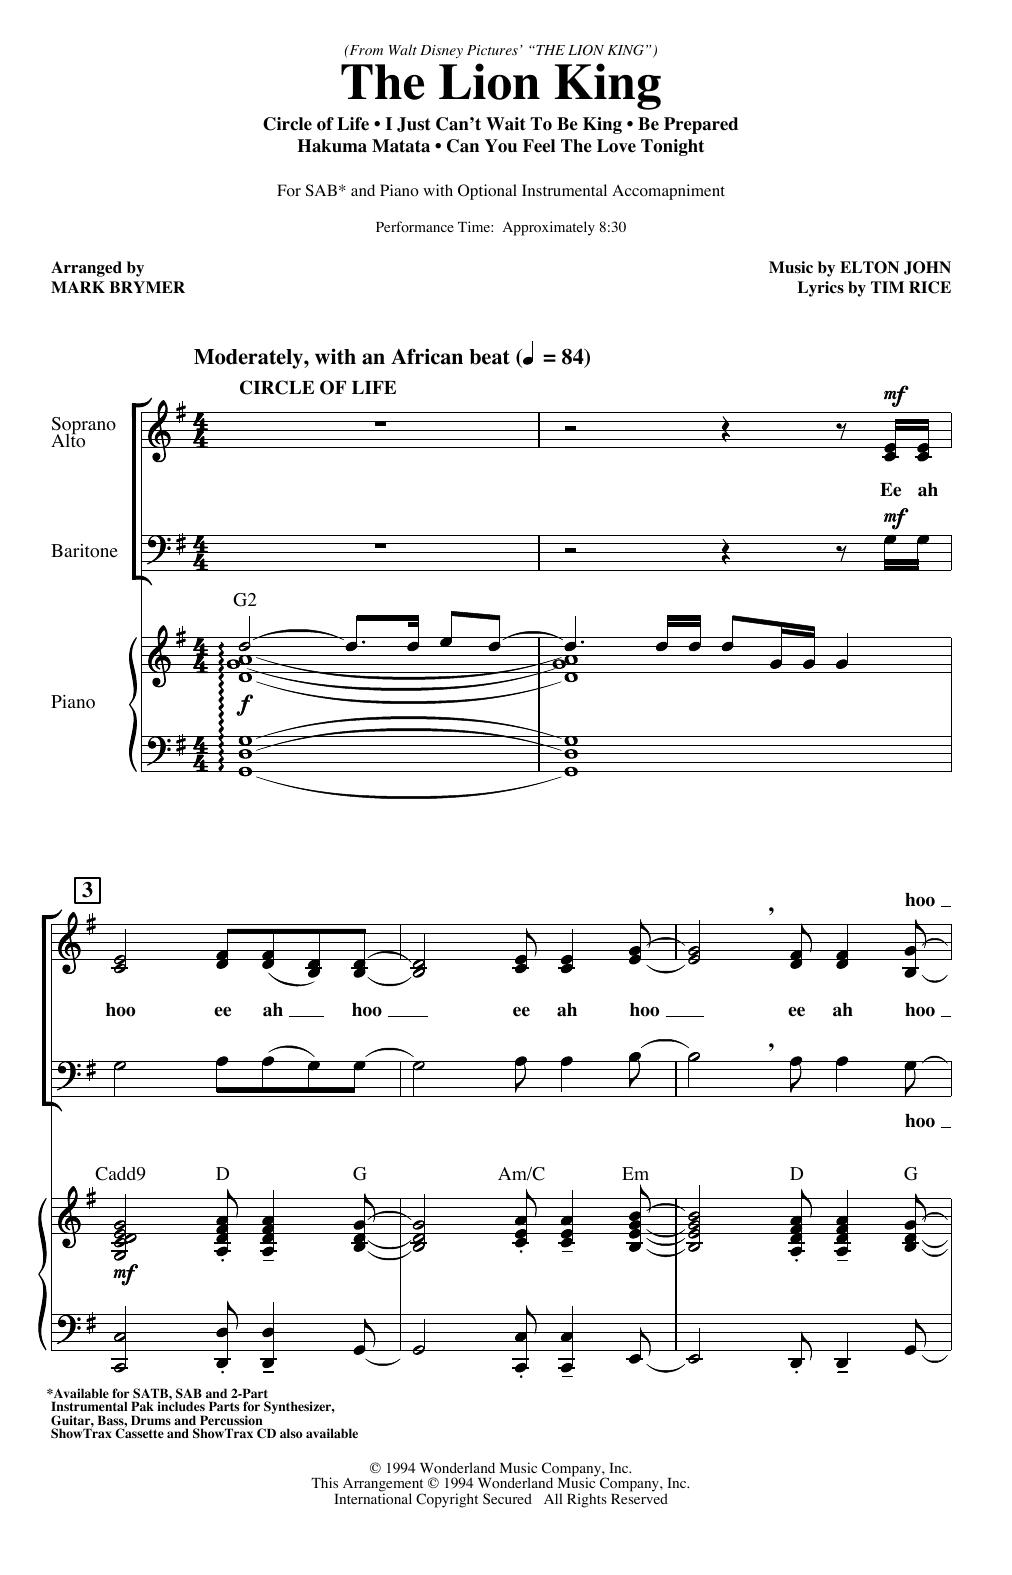 The Lion King (Medley) (arr  Mark Brymer) by Elton John 2-Part Choir  Digital Sheet Music